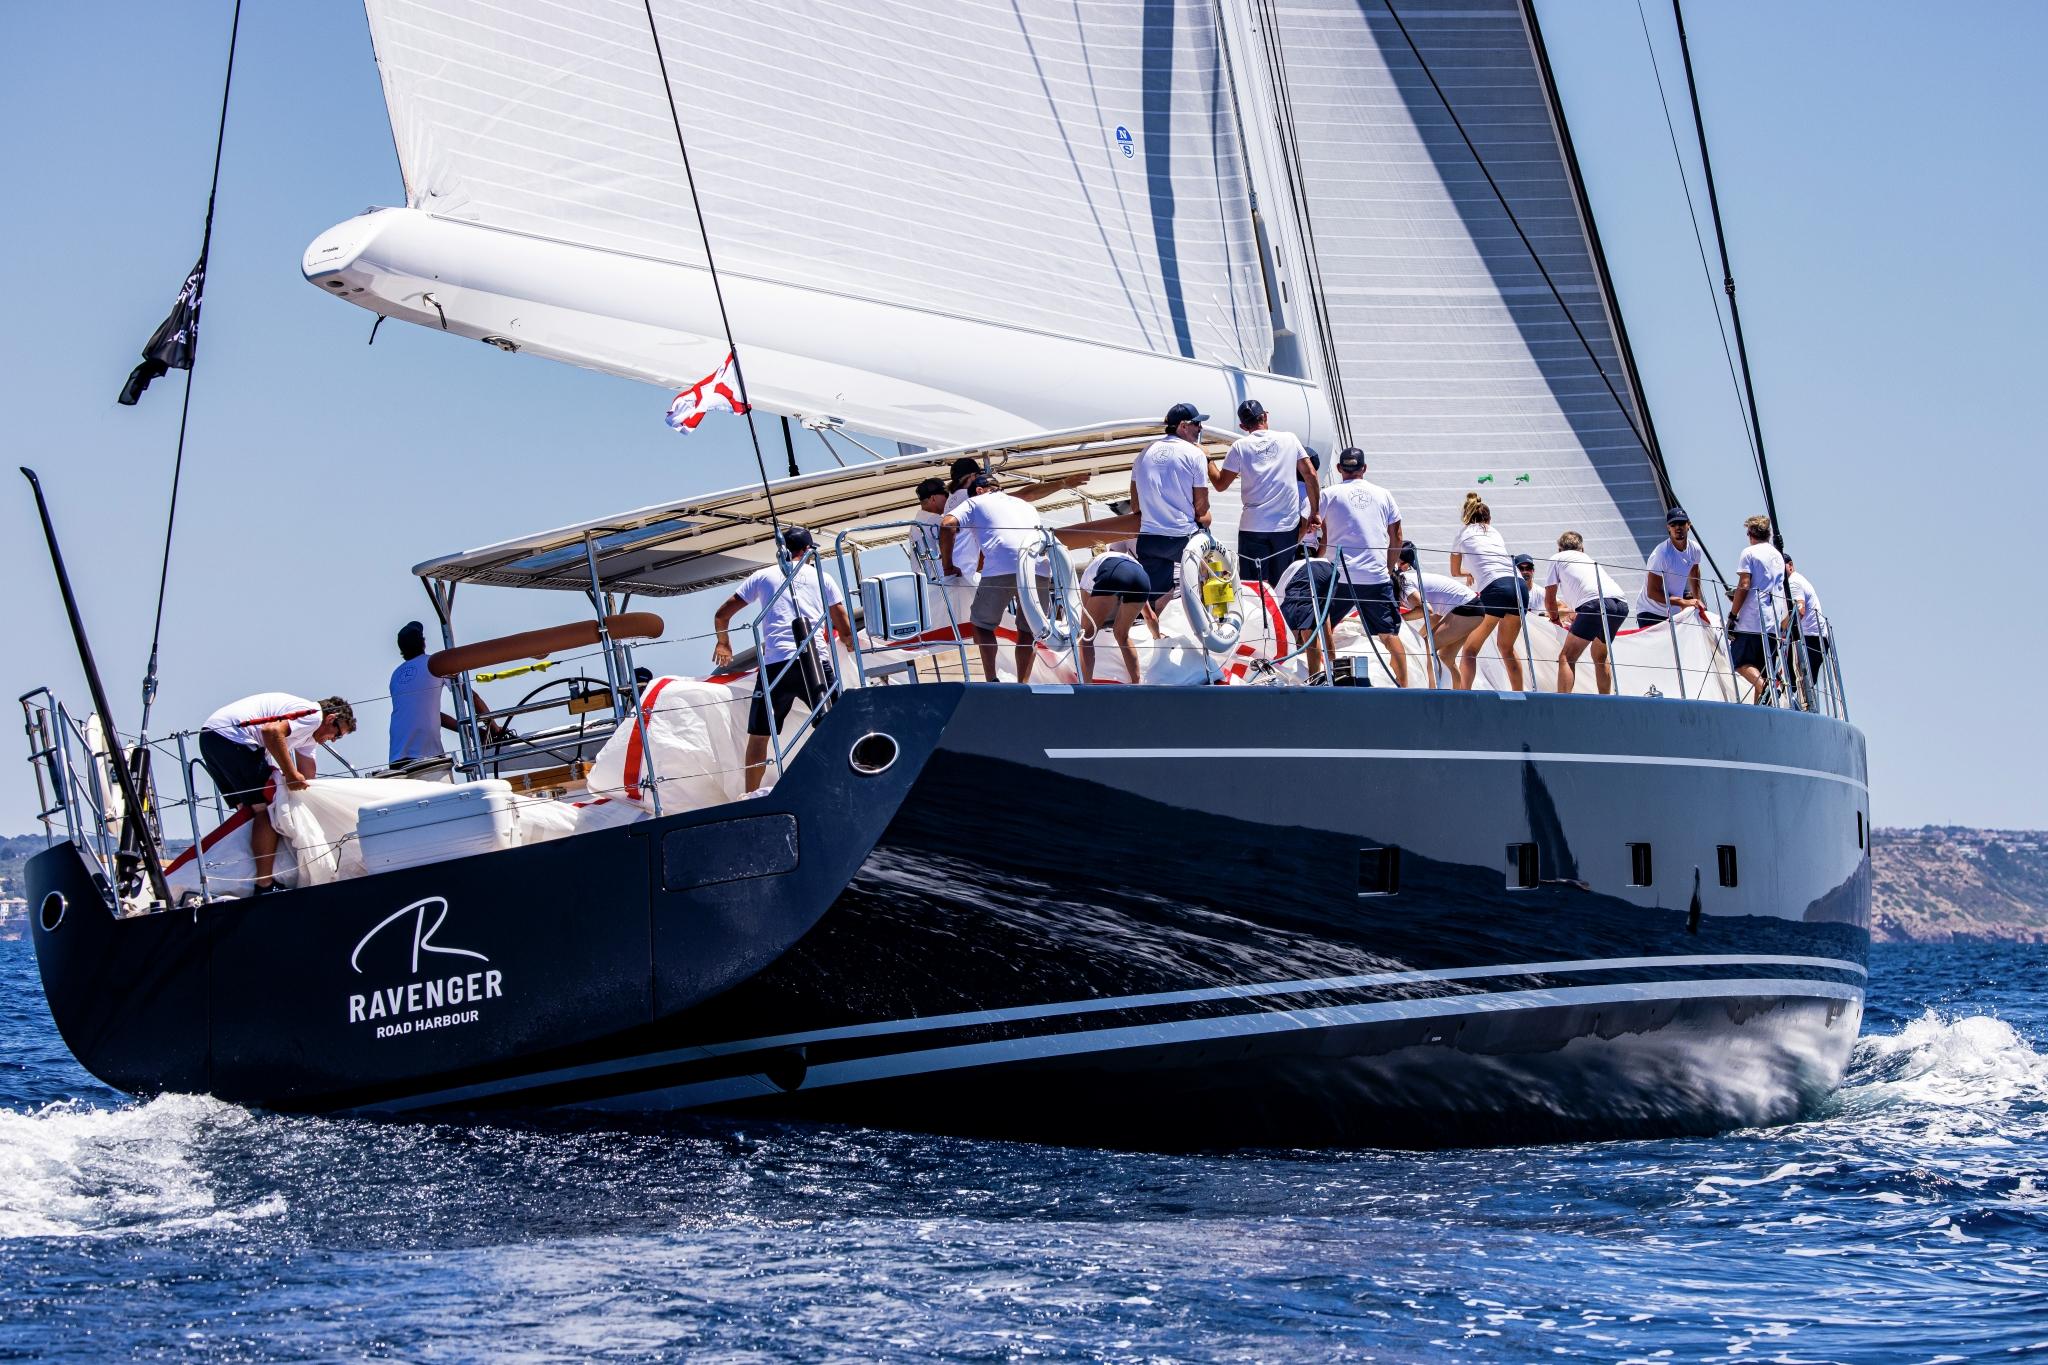 Superyacht Cup Palma 2021, overall winner of the regatta 'Ravenger'